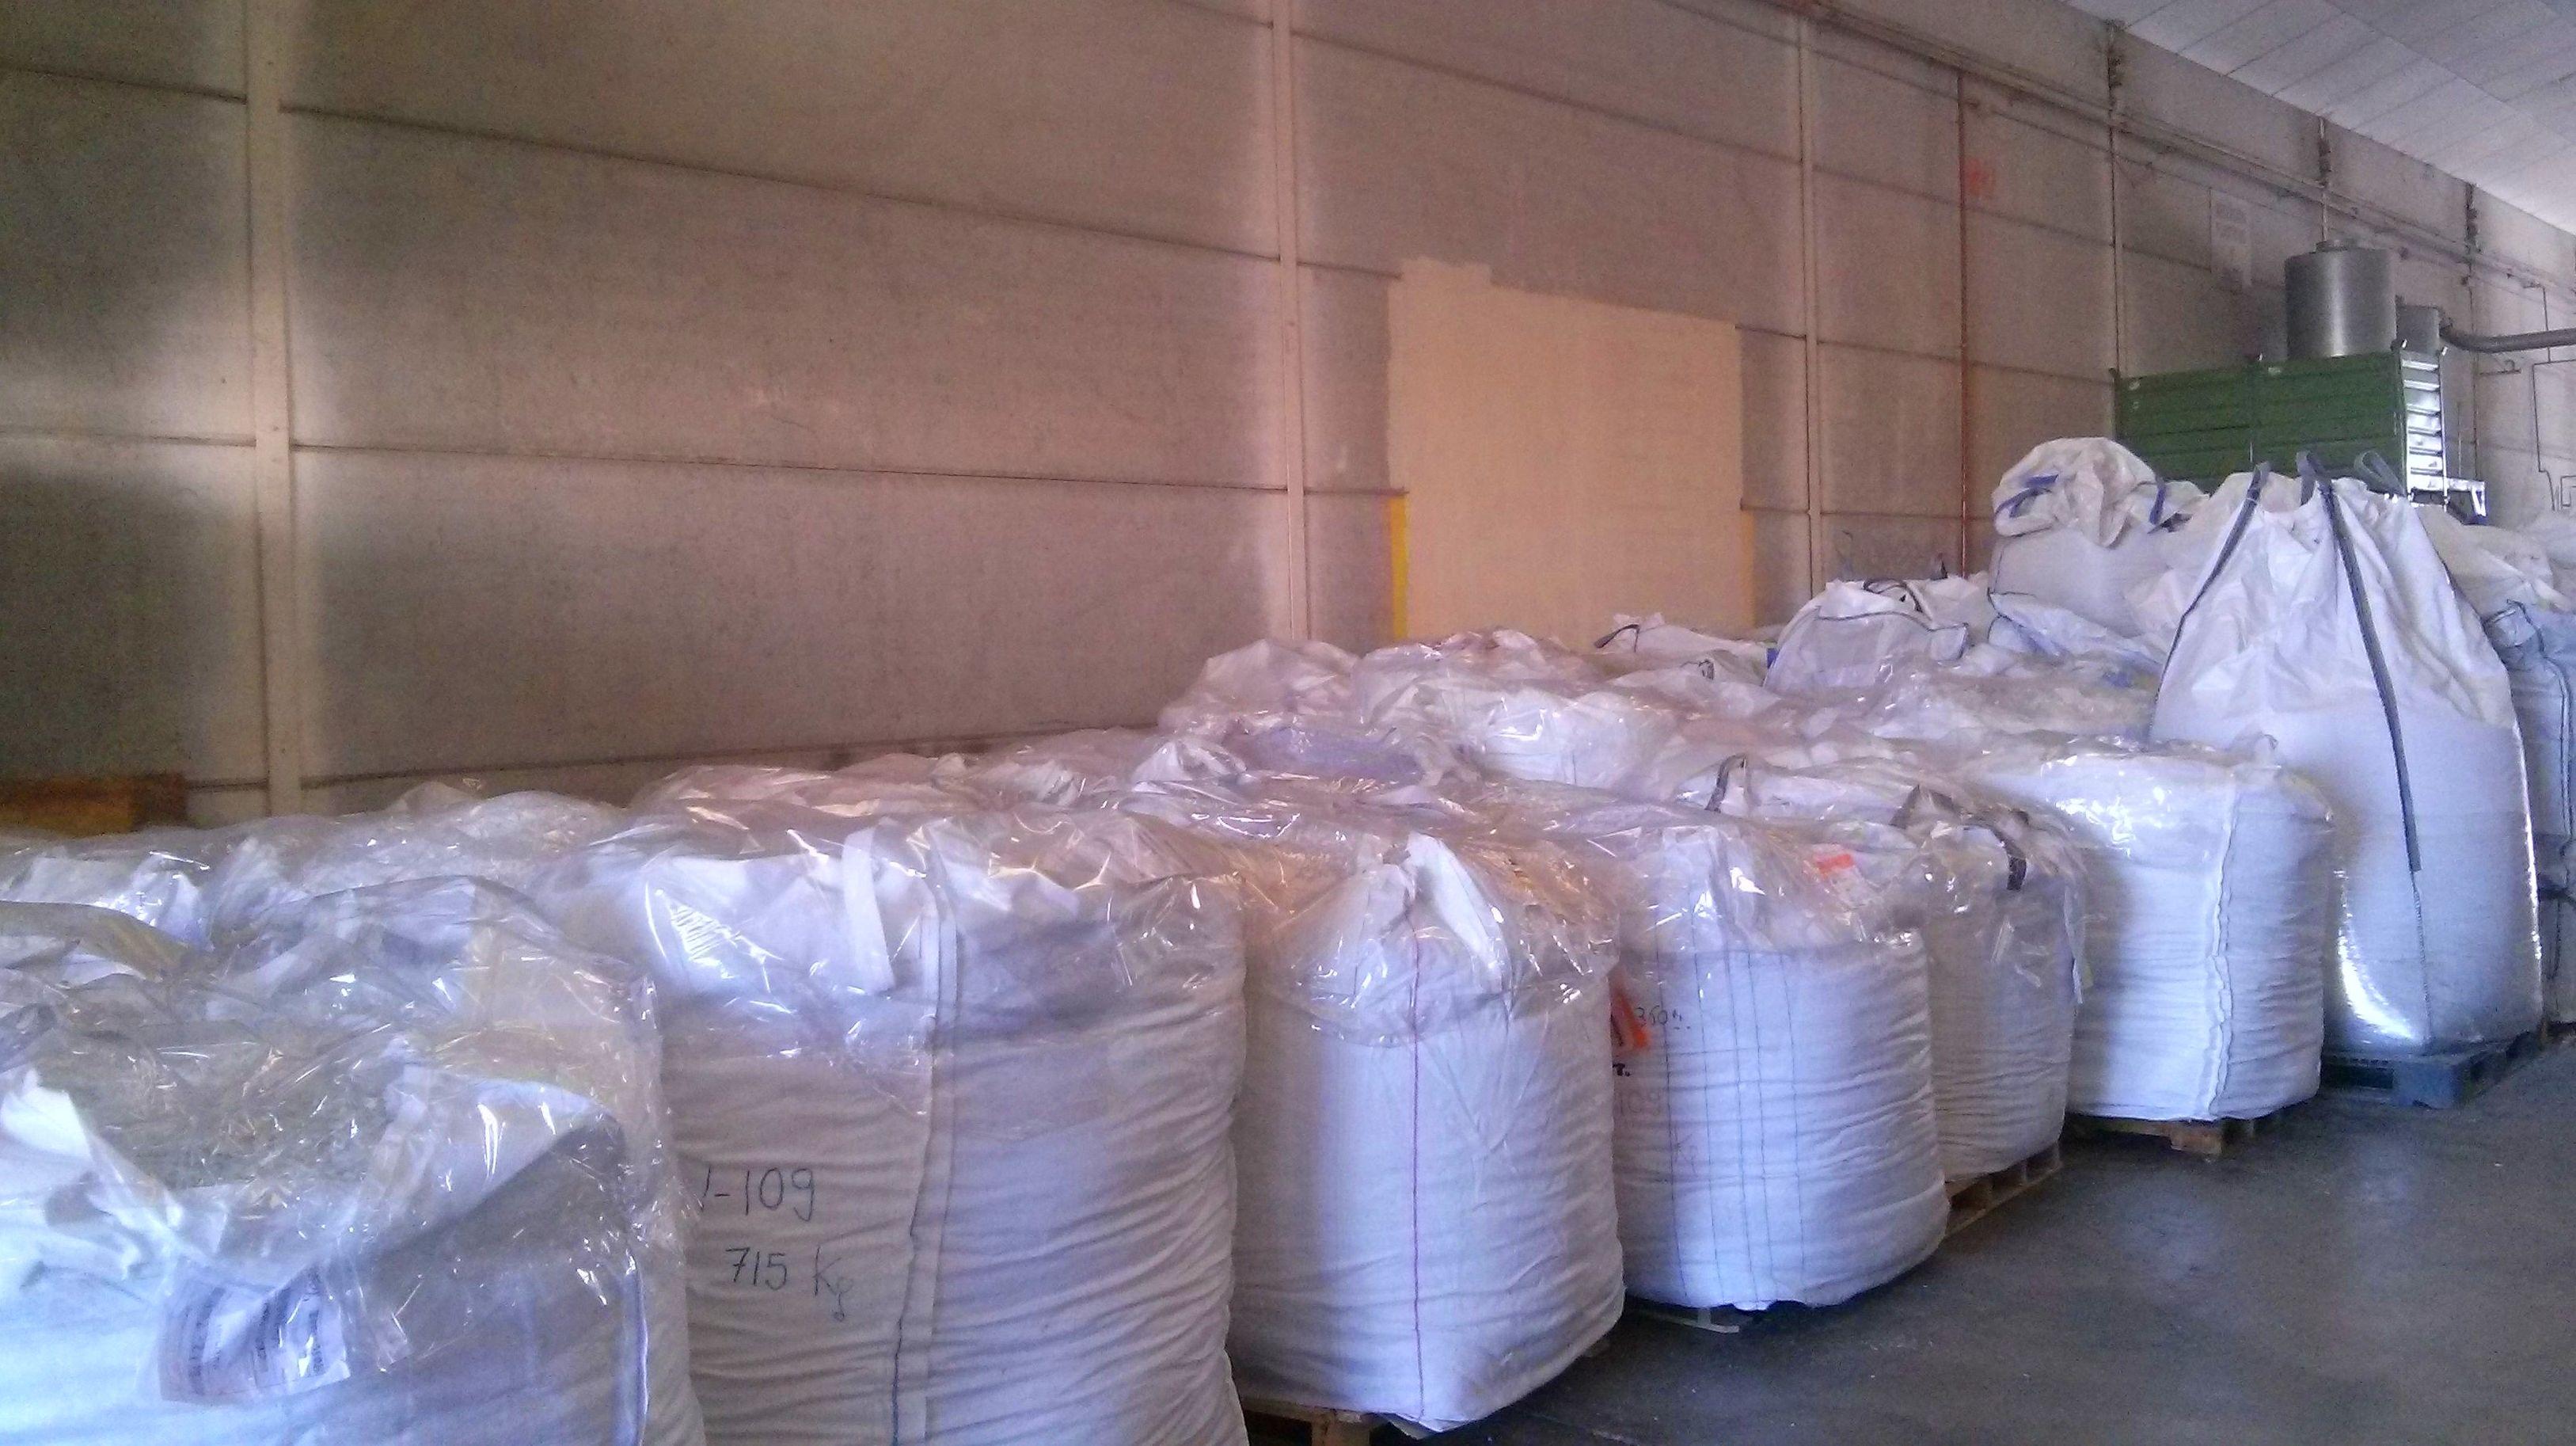 Foto 11 de Reciclaje de residuos en Manises | PalePlast, S. L.